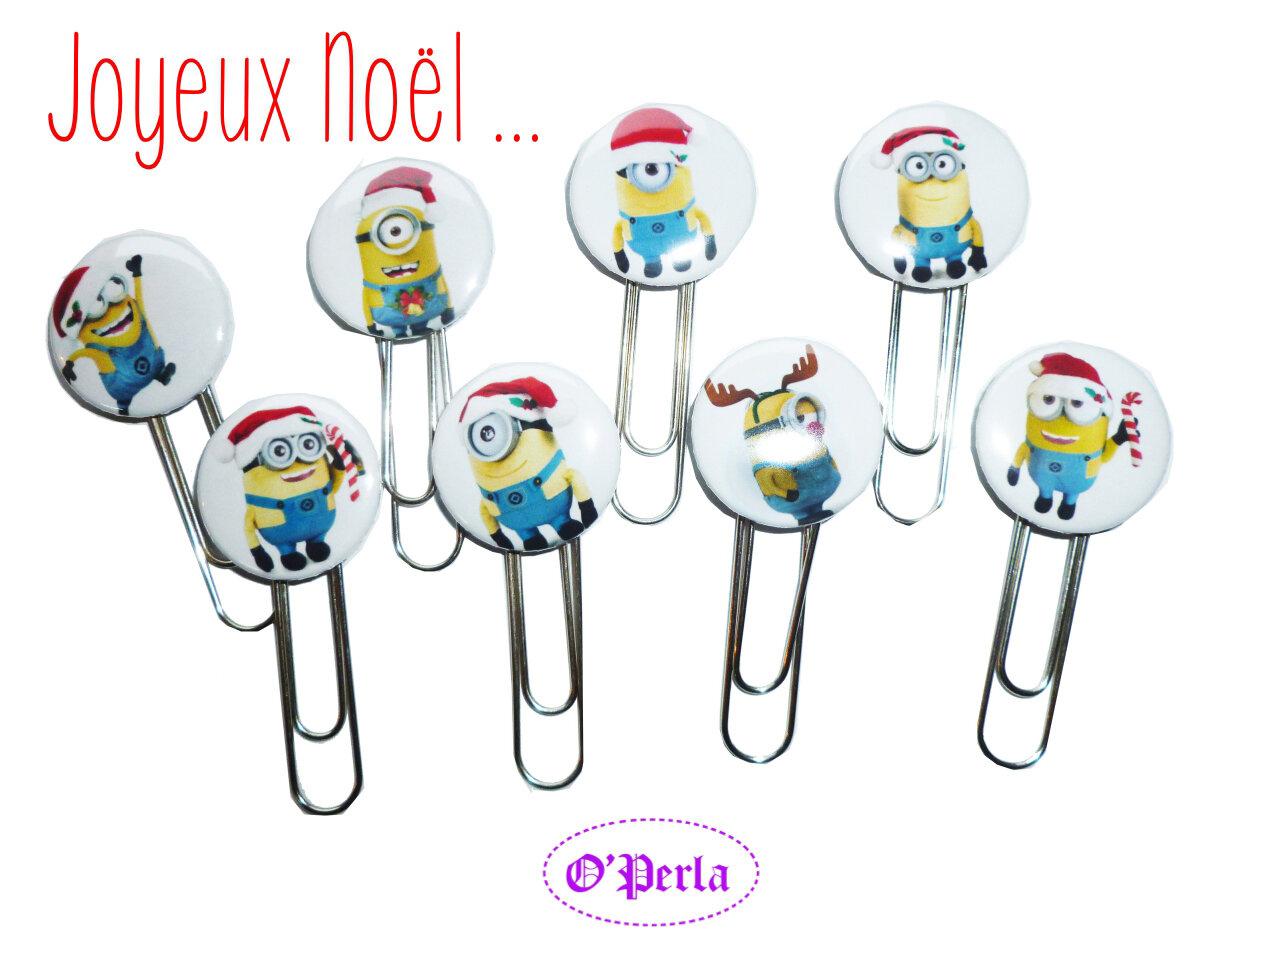 Mignon Noël !